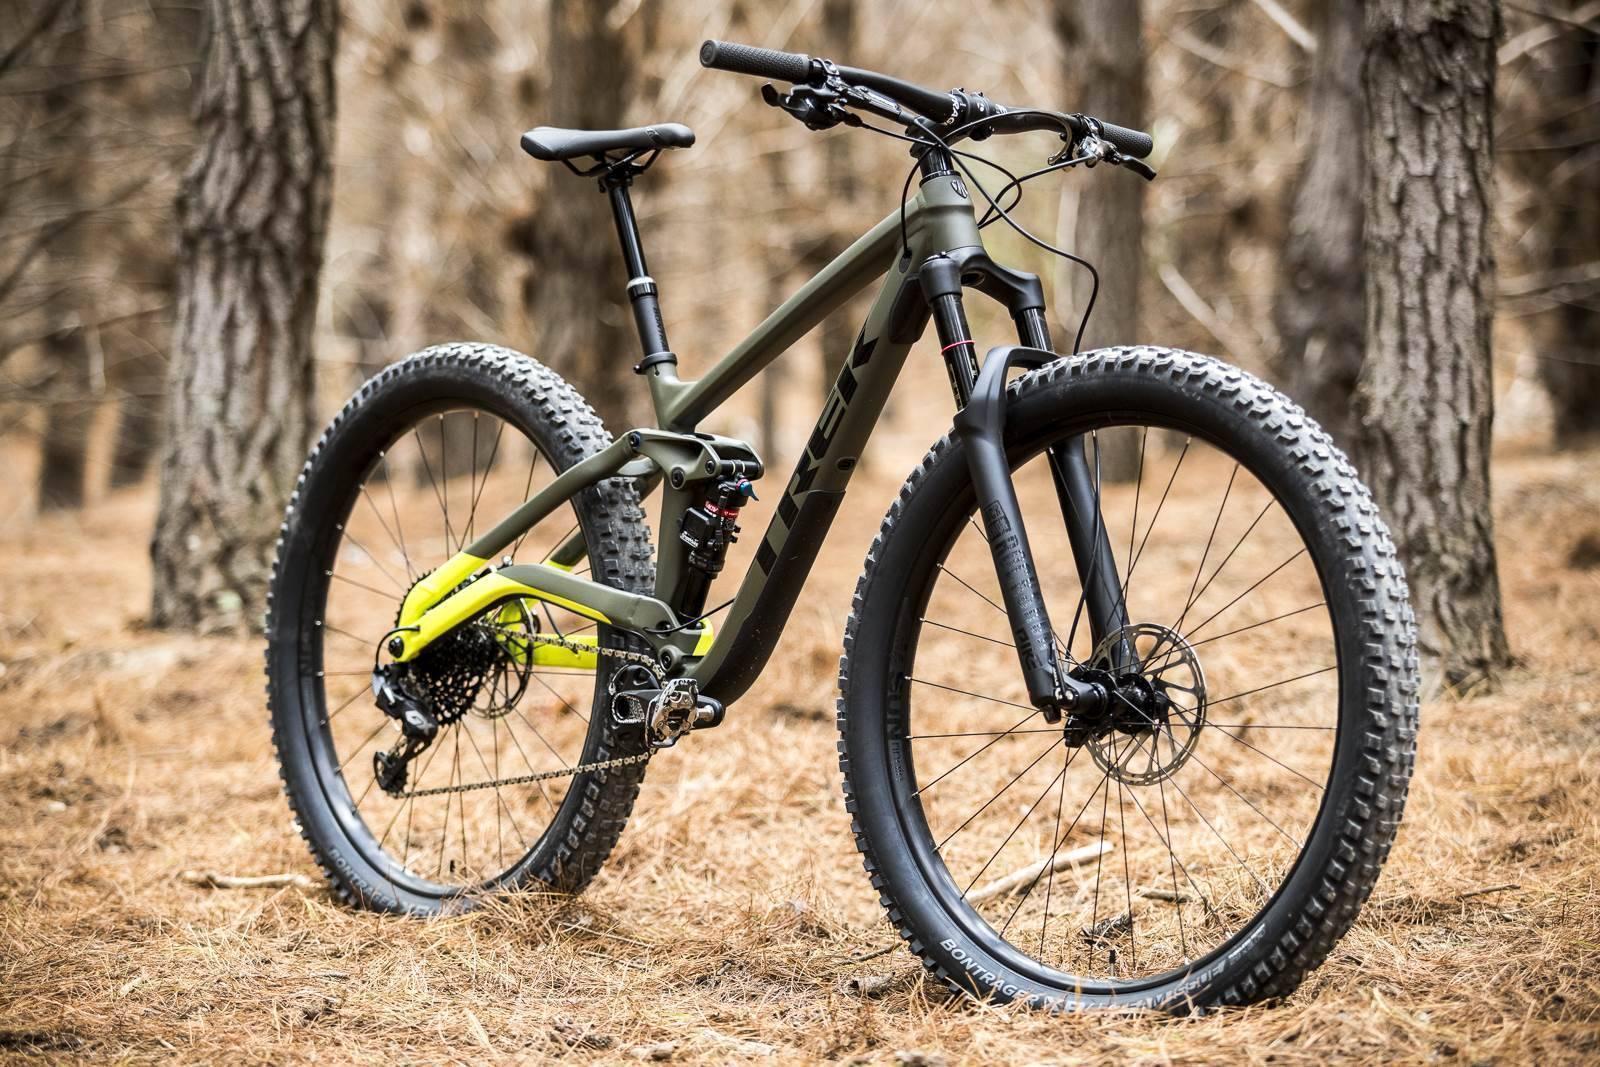 1ccb53041a5 TESTED: Trek Full Stache 29 Plus trail bike - Australian Mountain Bike |  The home for Australian Mountain Bikes